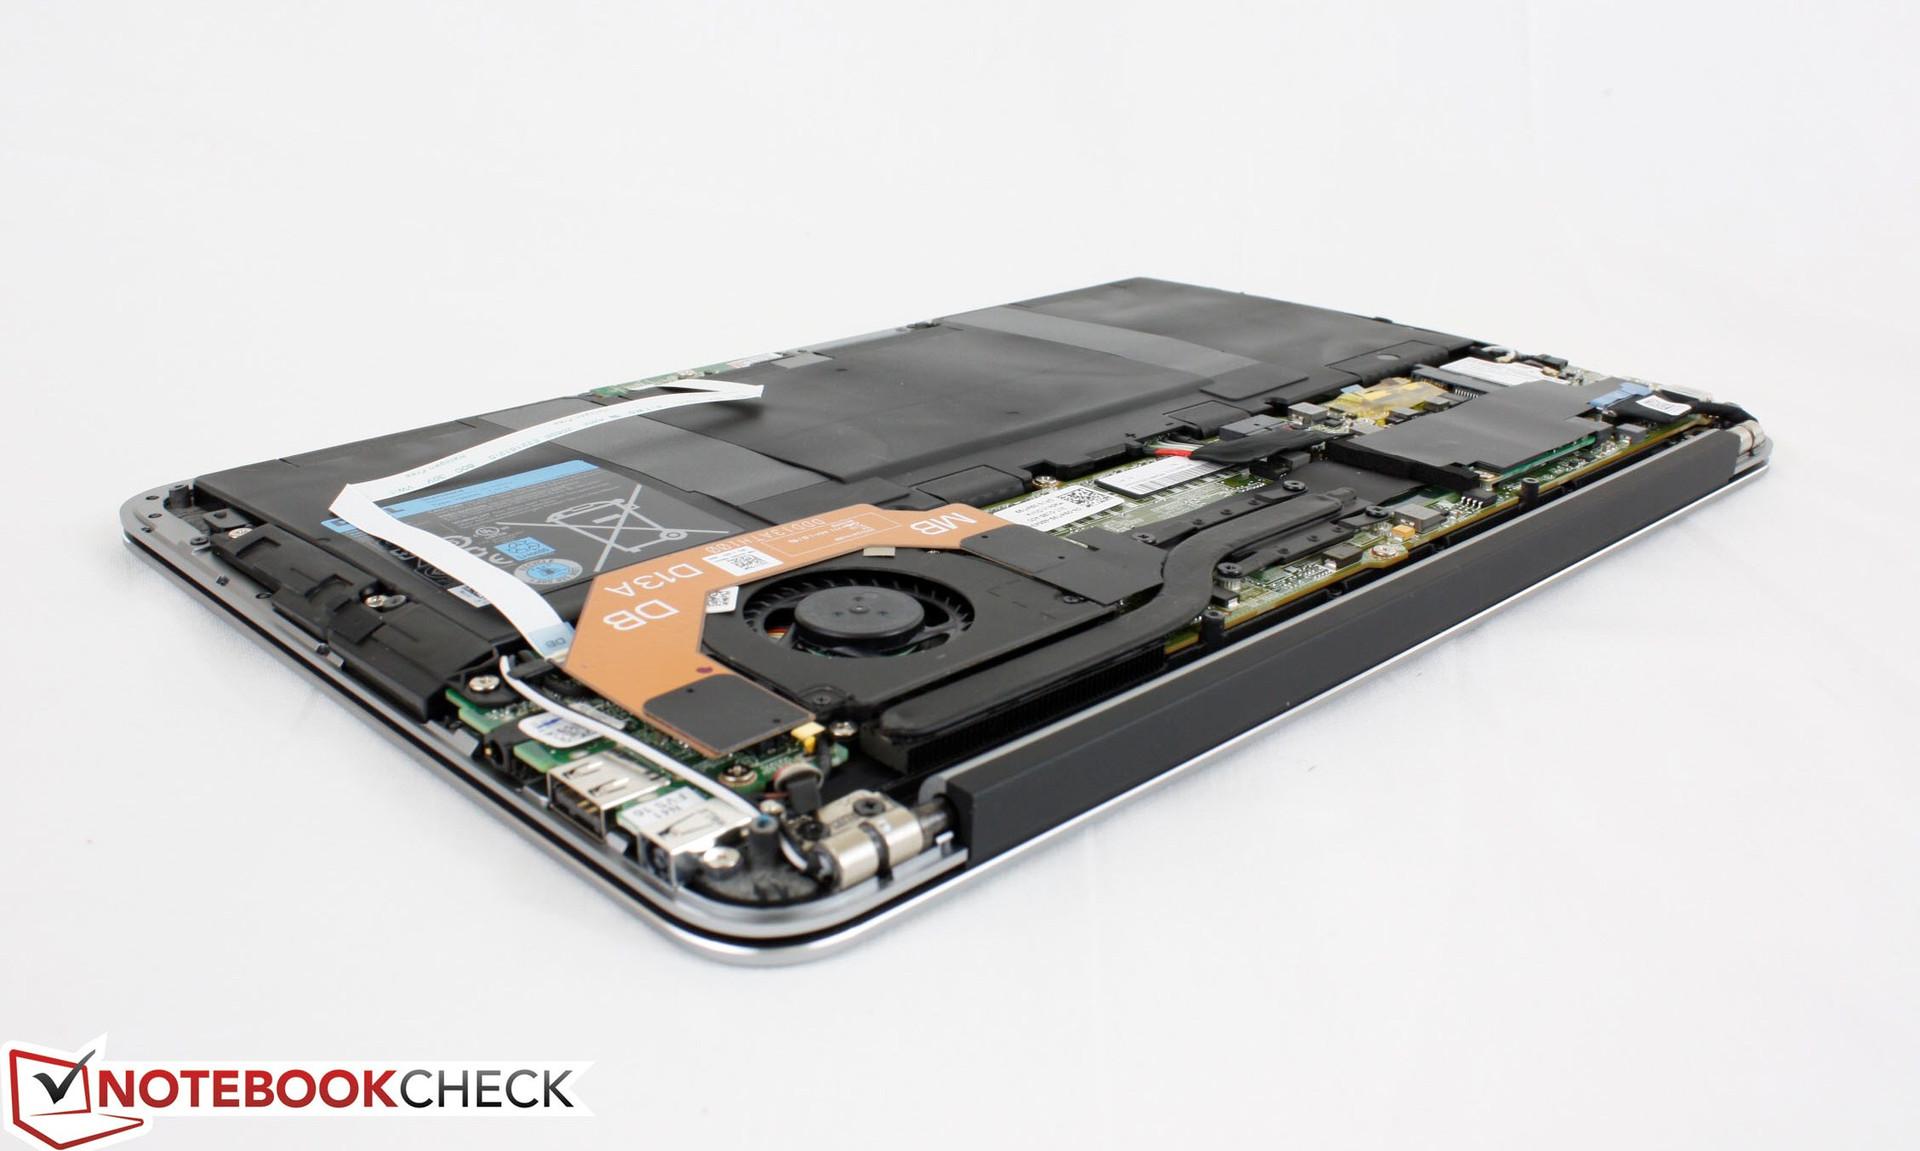 xps 13 ultrabook l322x review